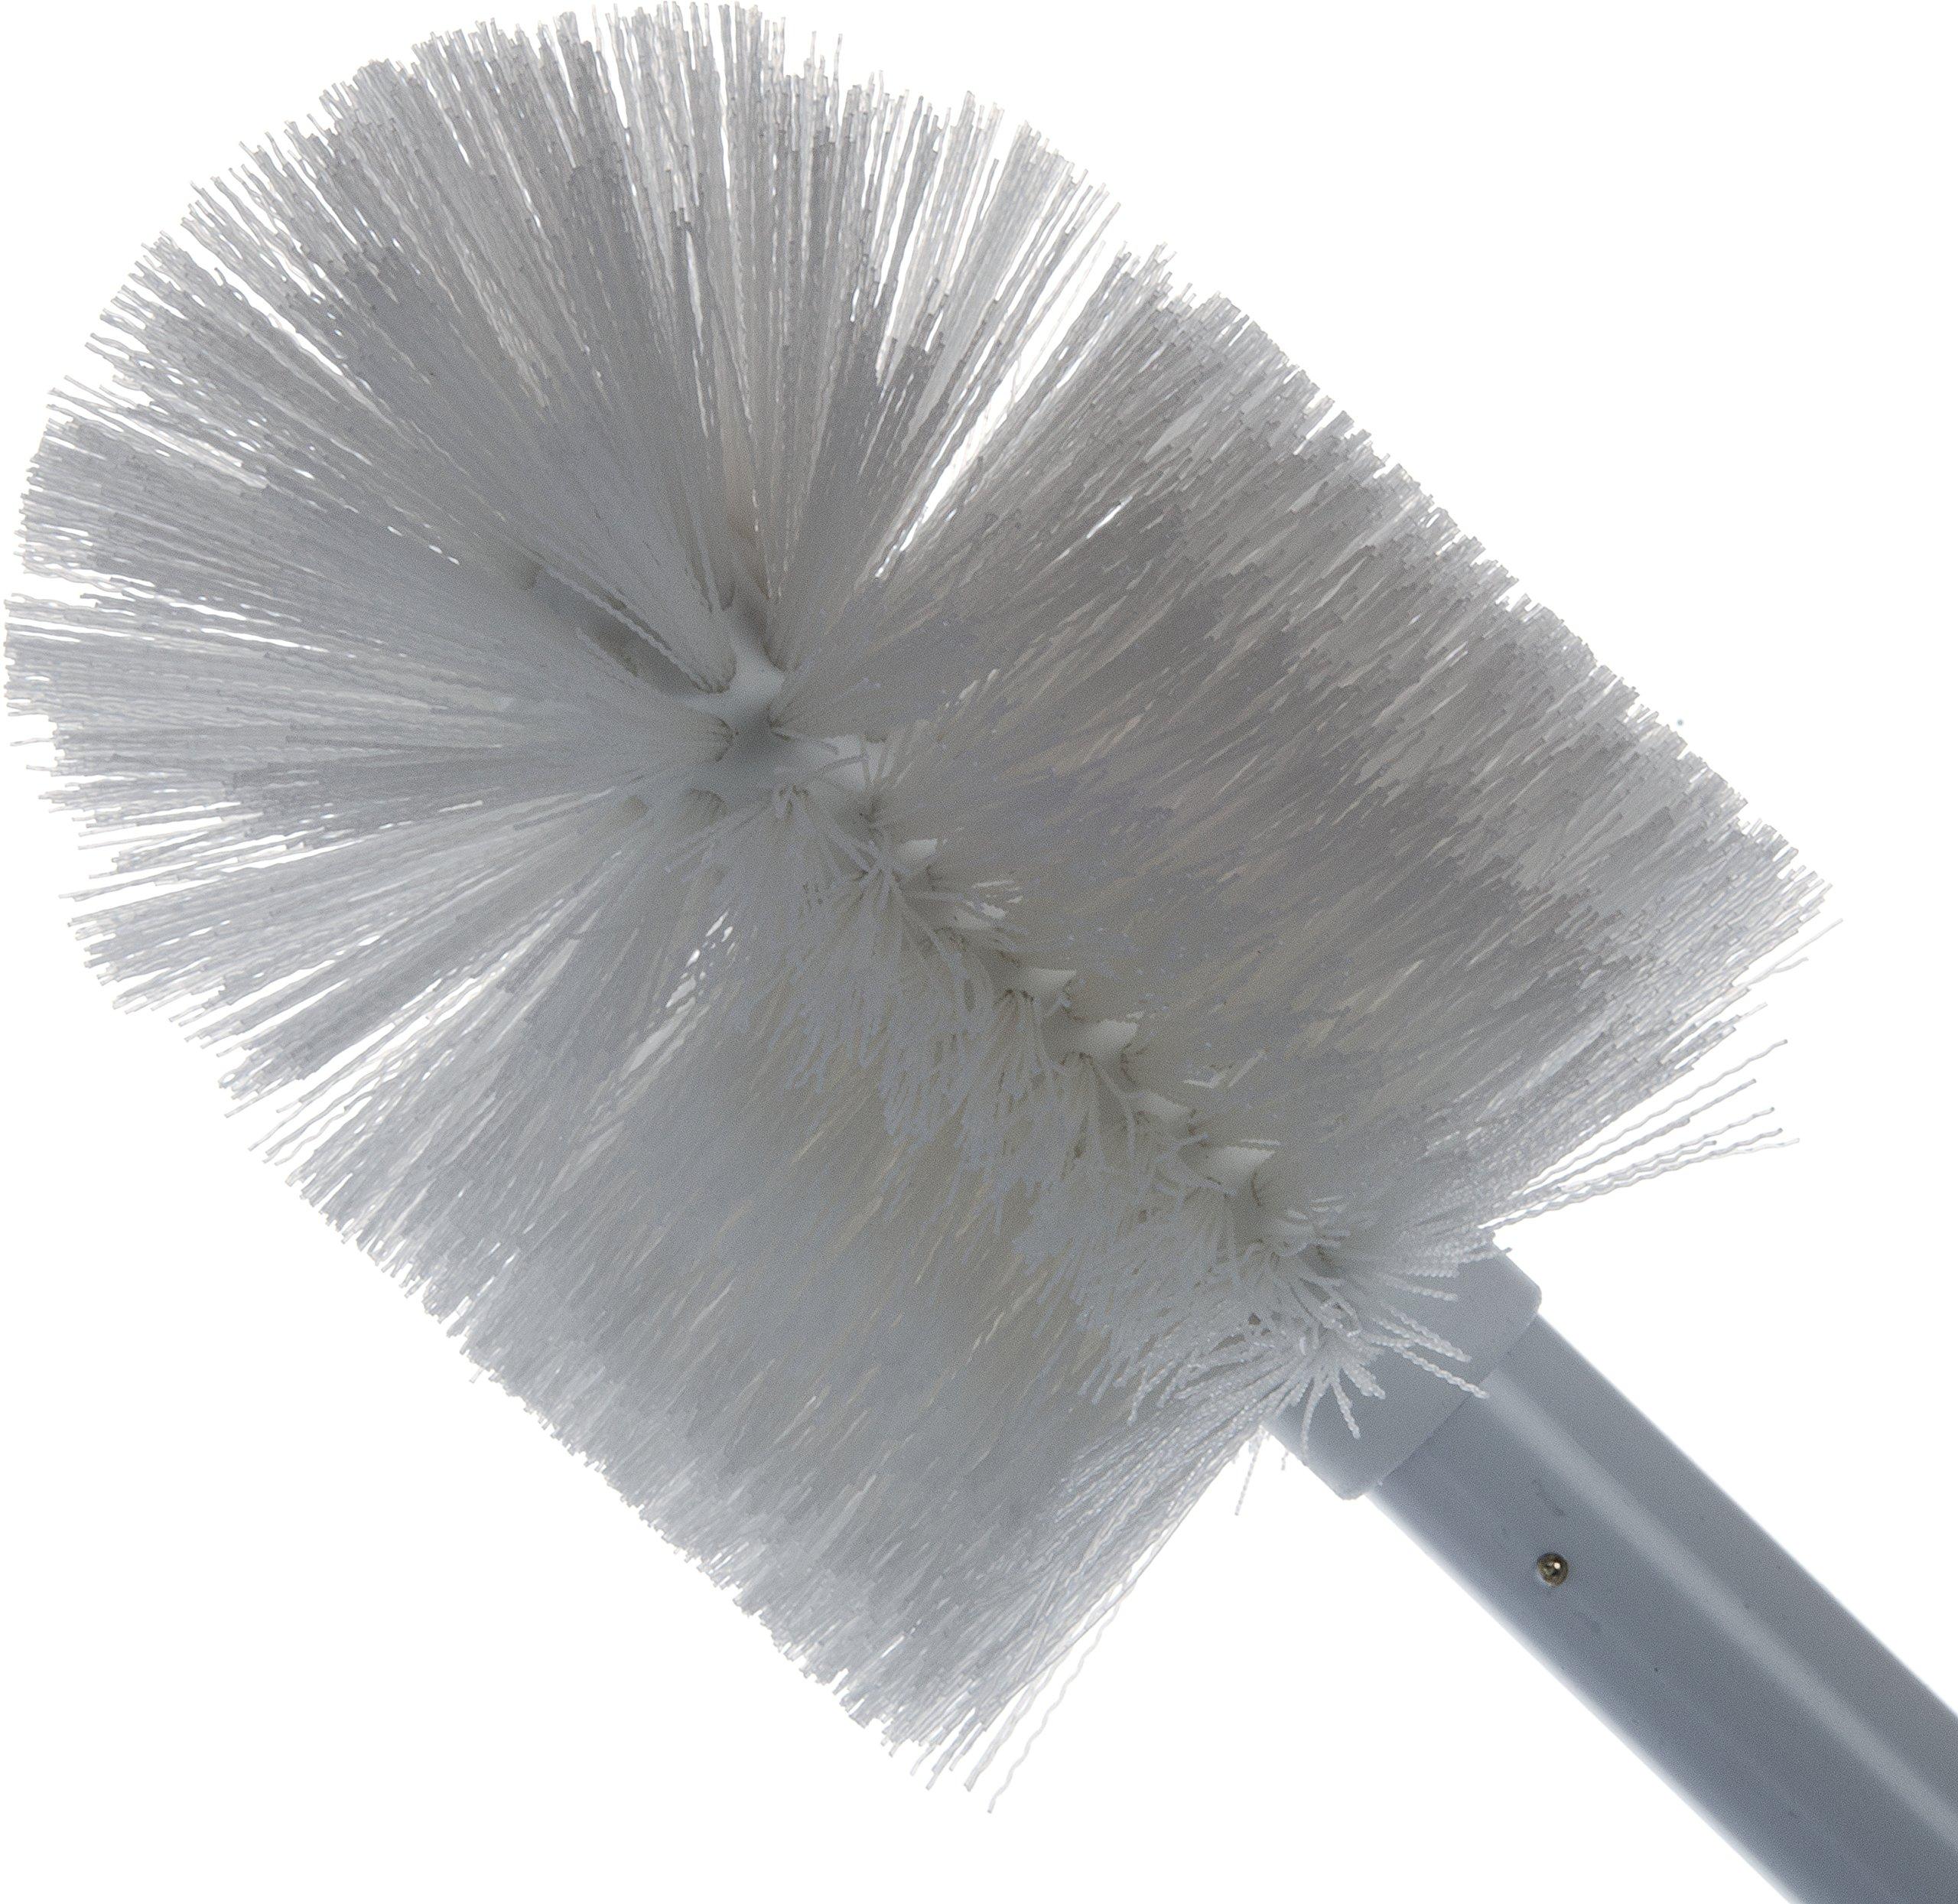 Carlisle 4000802 Sparta Spectrum Multi-Purpose Round Valve and Fitting Brush, Plastic Handle, White Polyester Bristles, 6'' L x 5'' Dia. Brush, 30'' Overall Length (Case of 6) by Carlisle (Image #5)